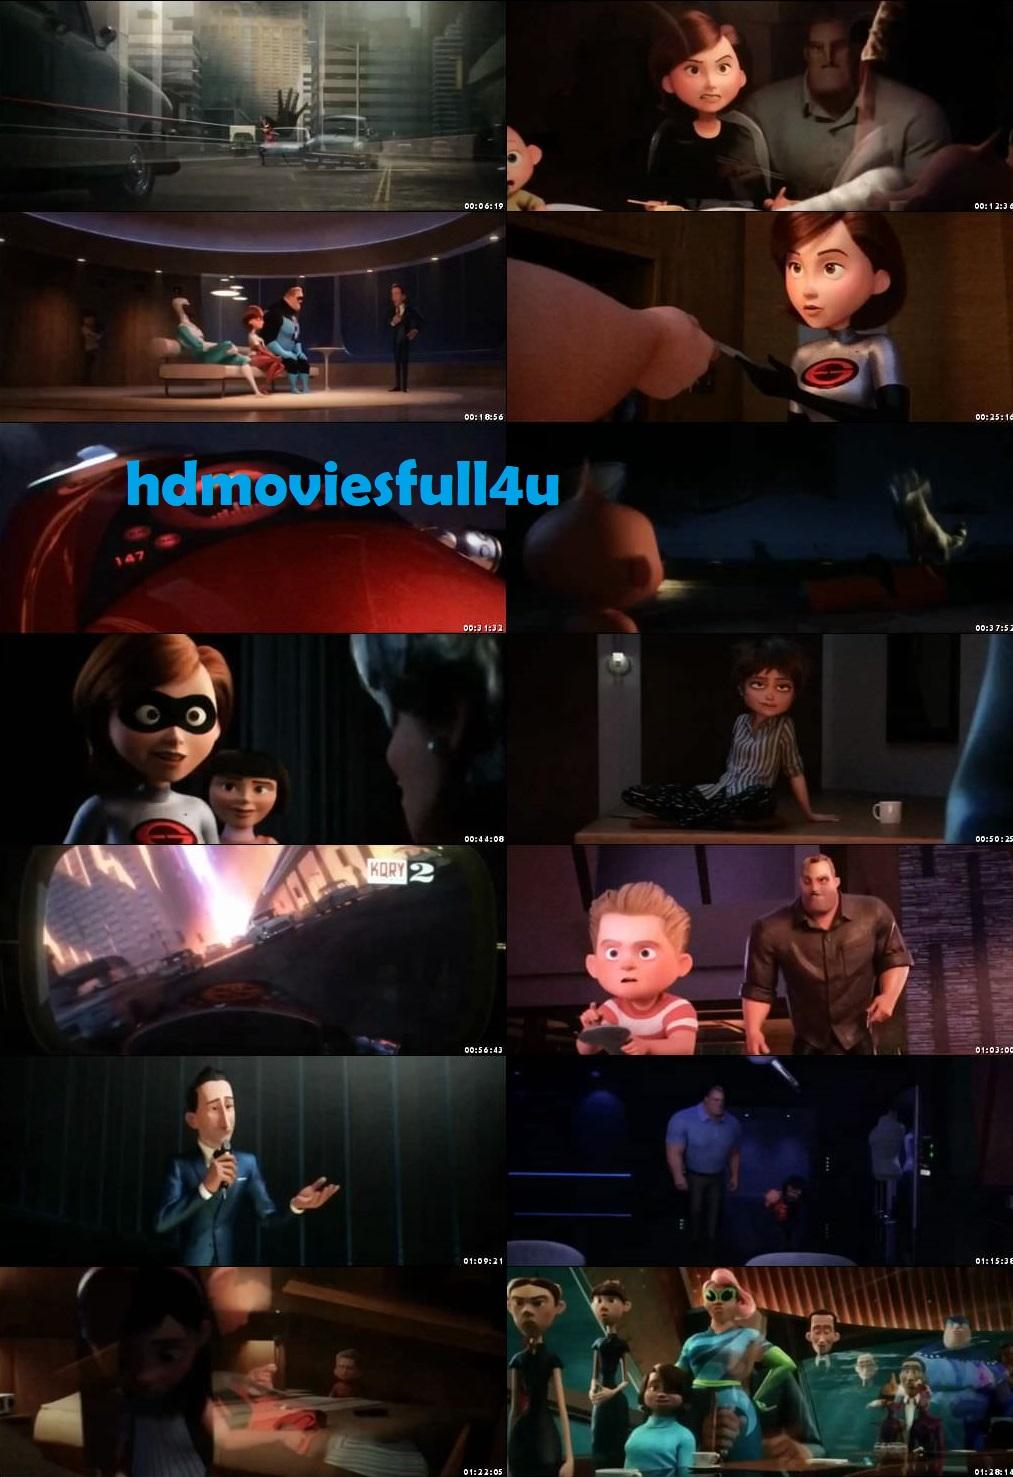 Incredibles 2 (2018) movie 720p [1.1GB] - HDMoviesFull4u